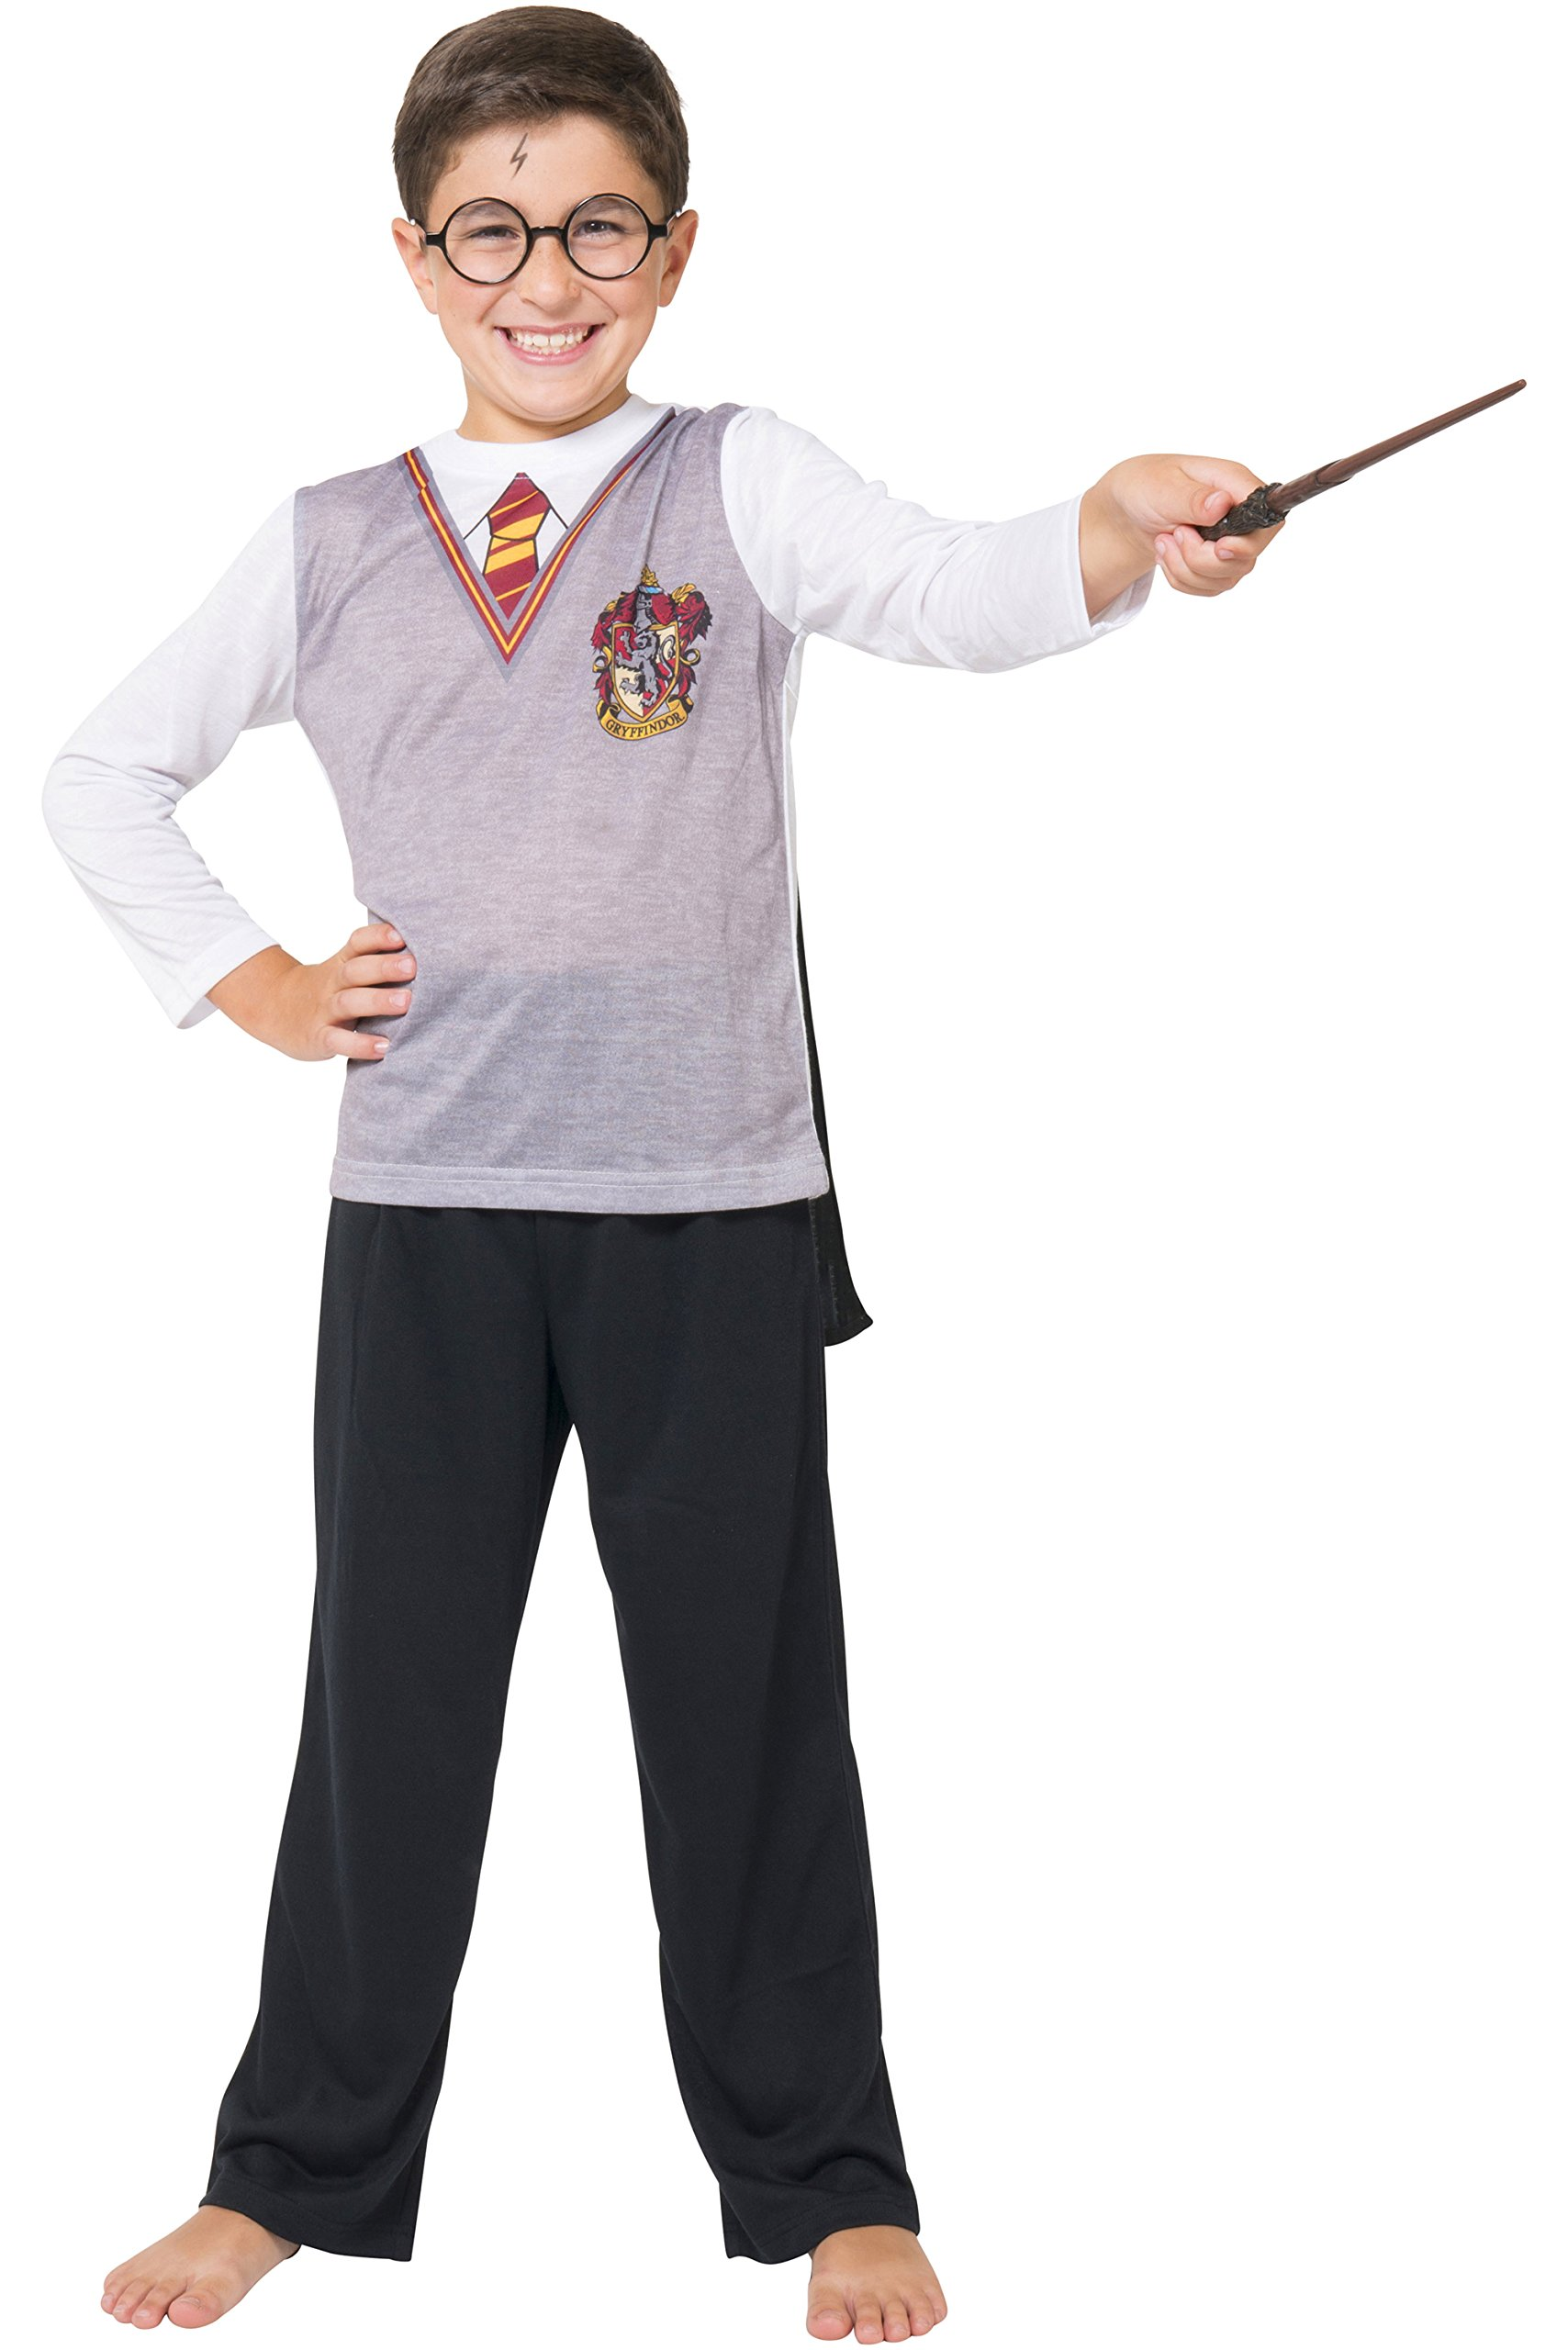 Harry Potter Big Boys Ls Gryffindor Uniform with Cape 3 Piece Pj Set